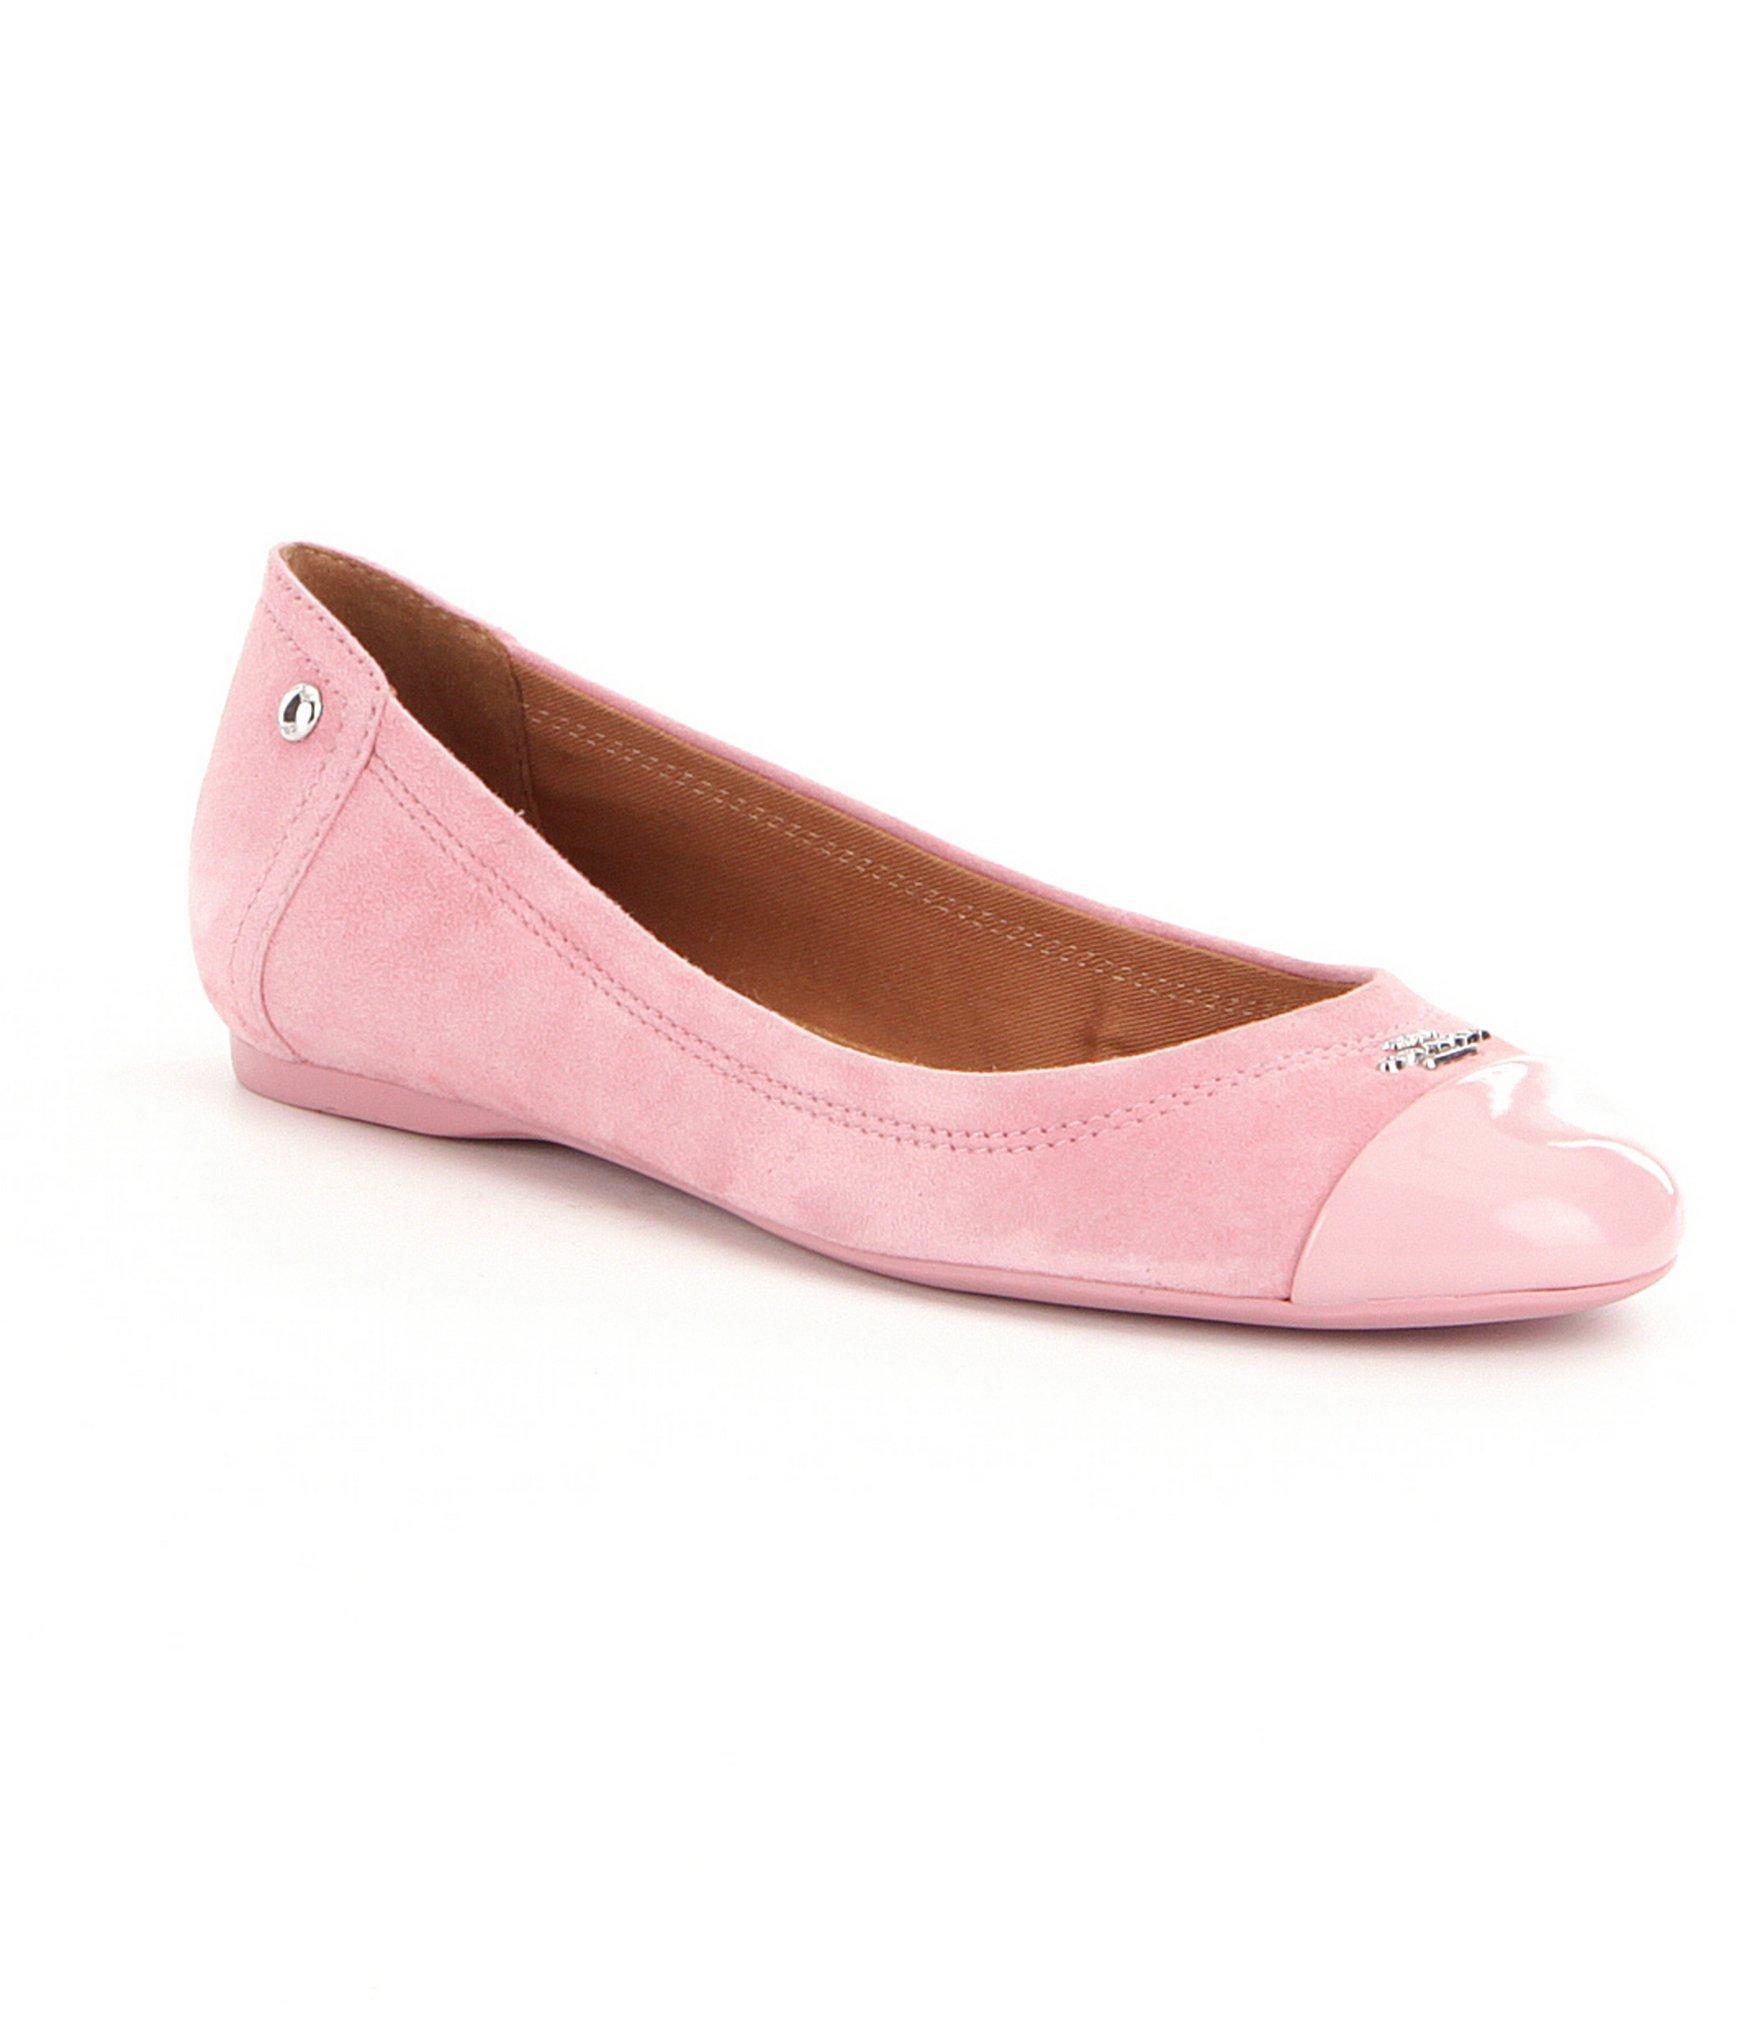 76b62c203a20 ... australia lyst coach chelsea suede ballet flats in pink fdb8b 9b2ec